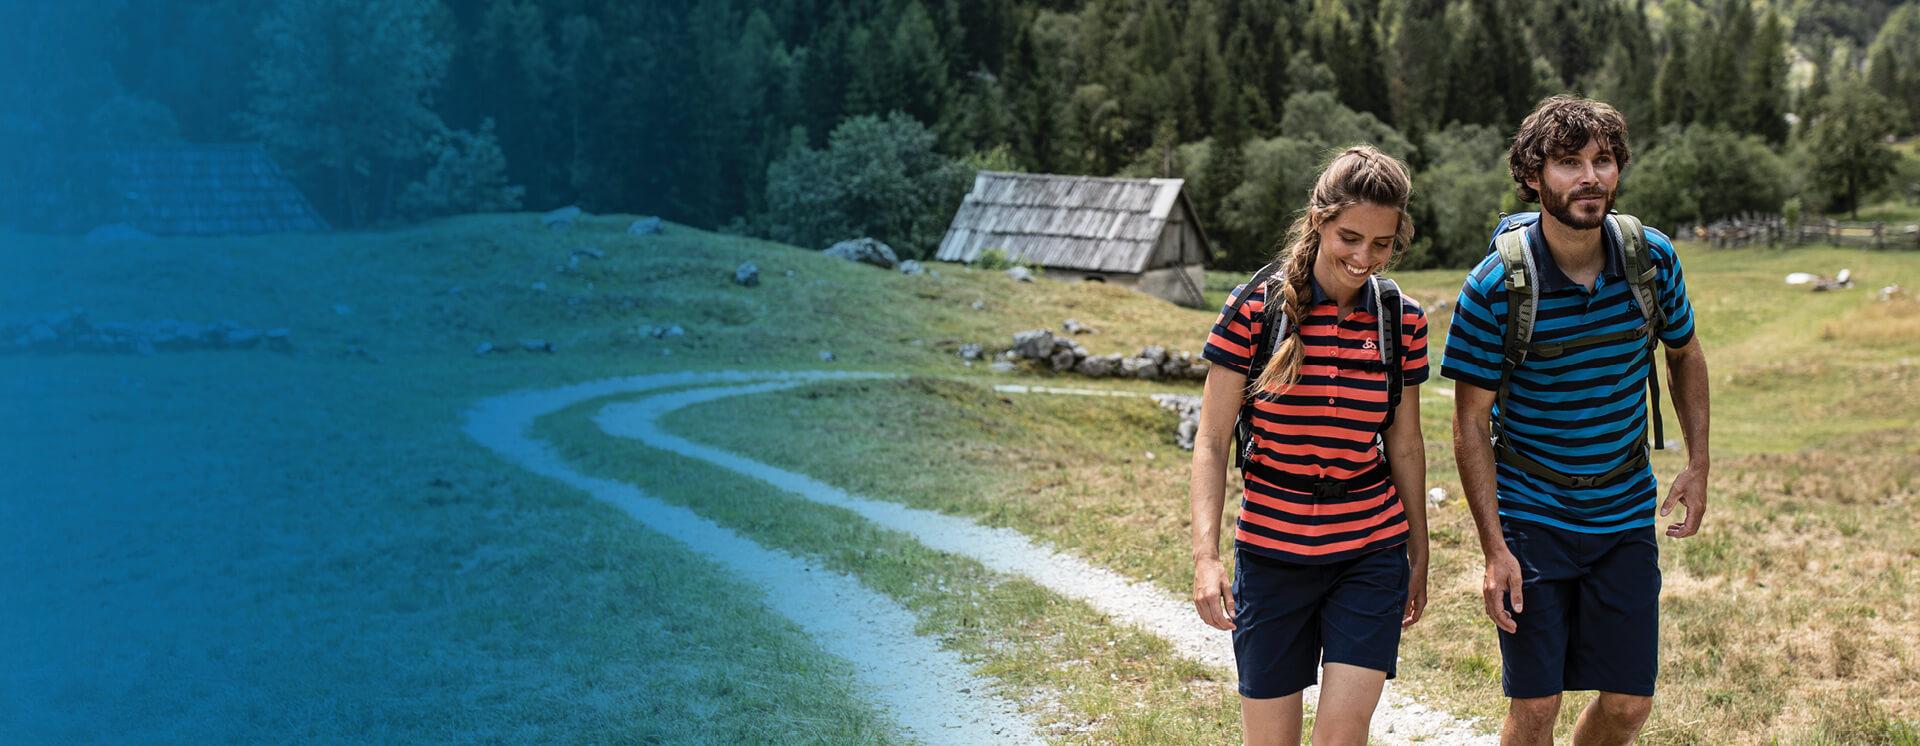 Men & Women hiking & trekking collection